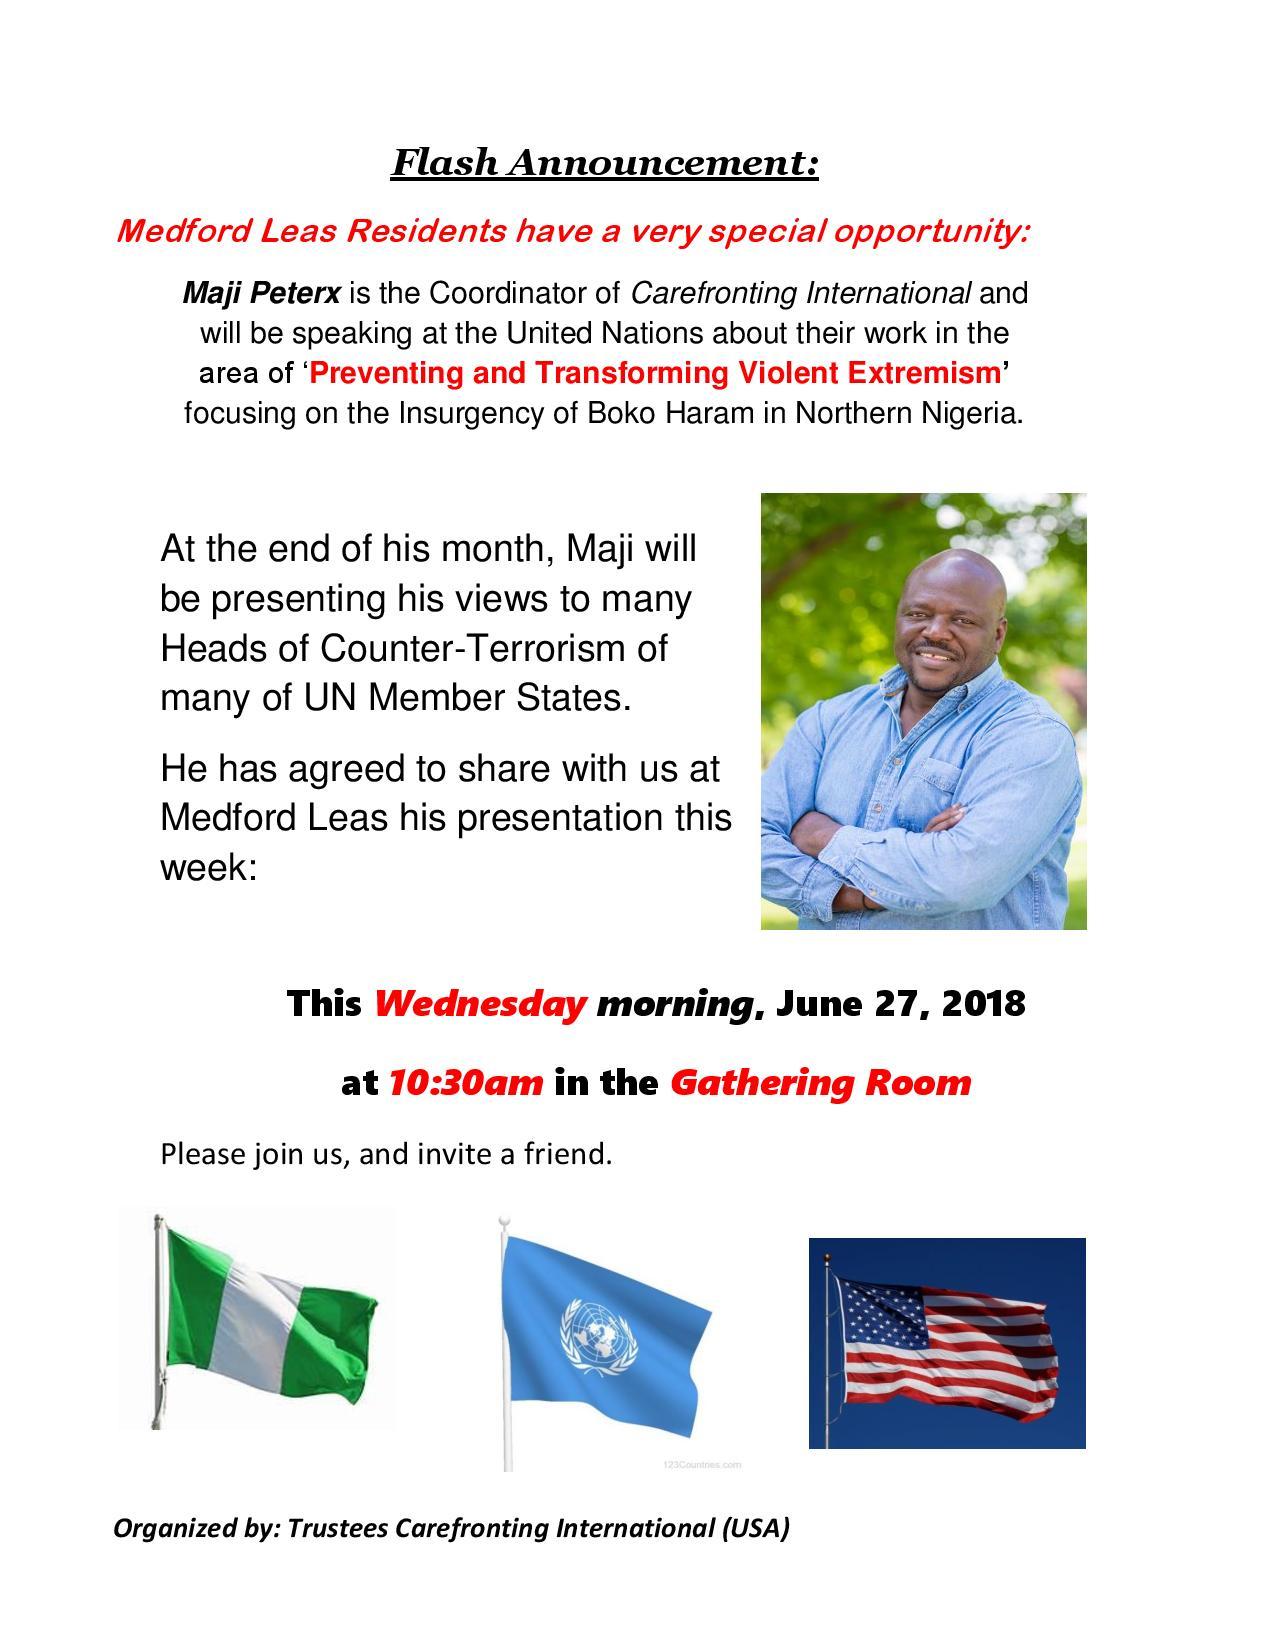 Latest Announcement- Insurgency of Boko Haram